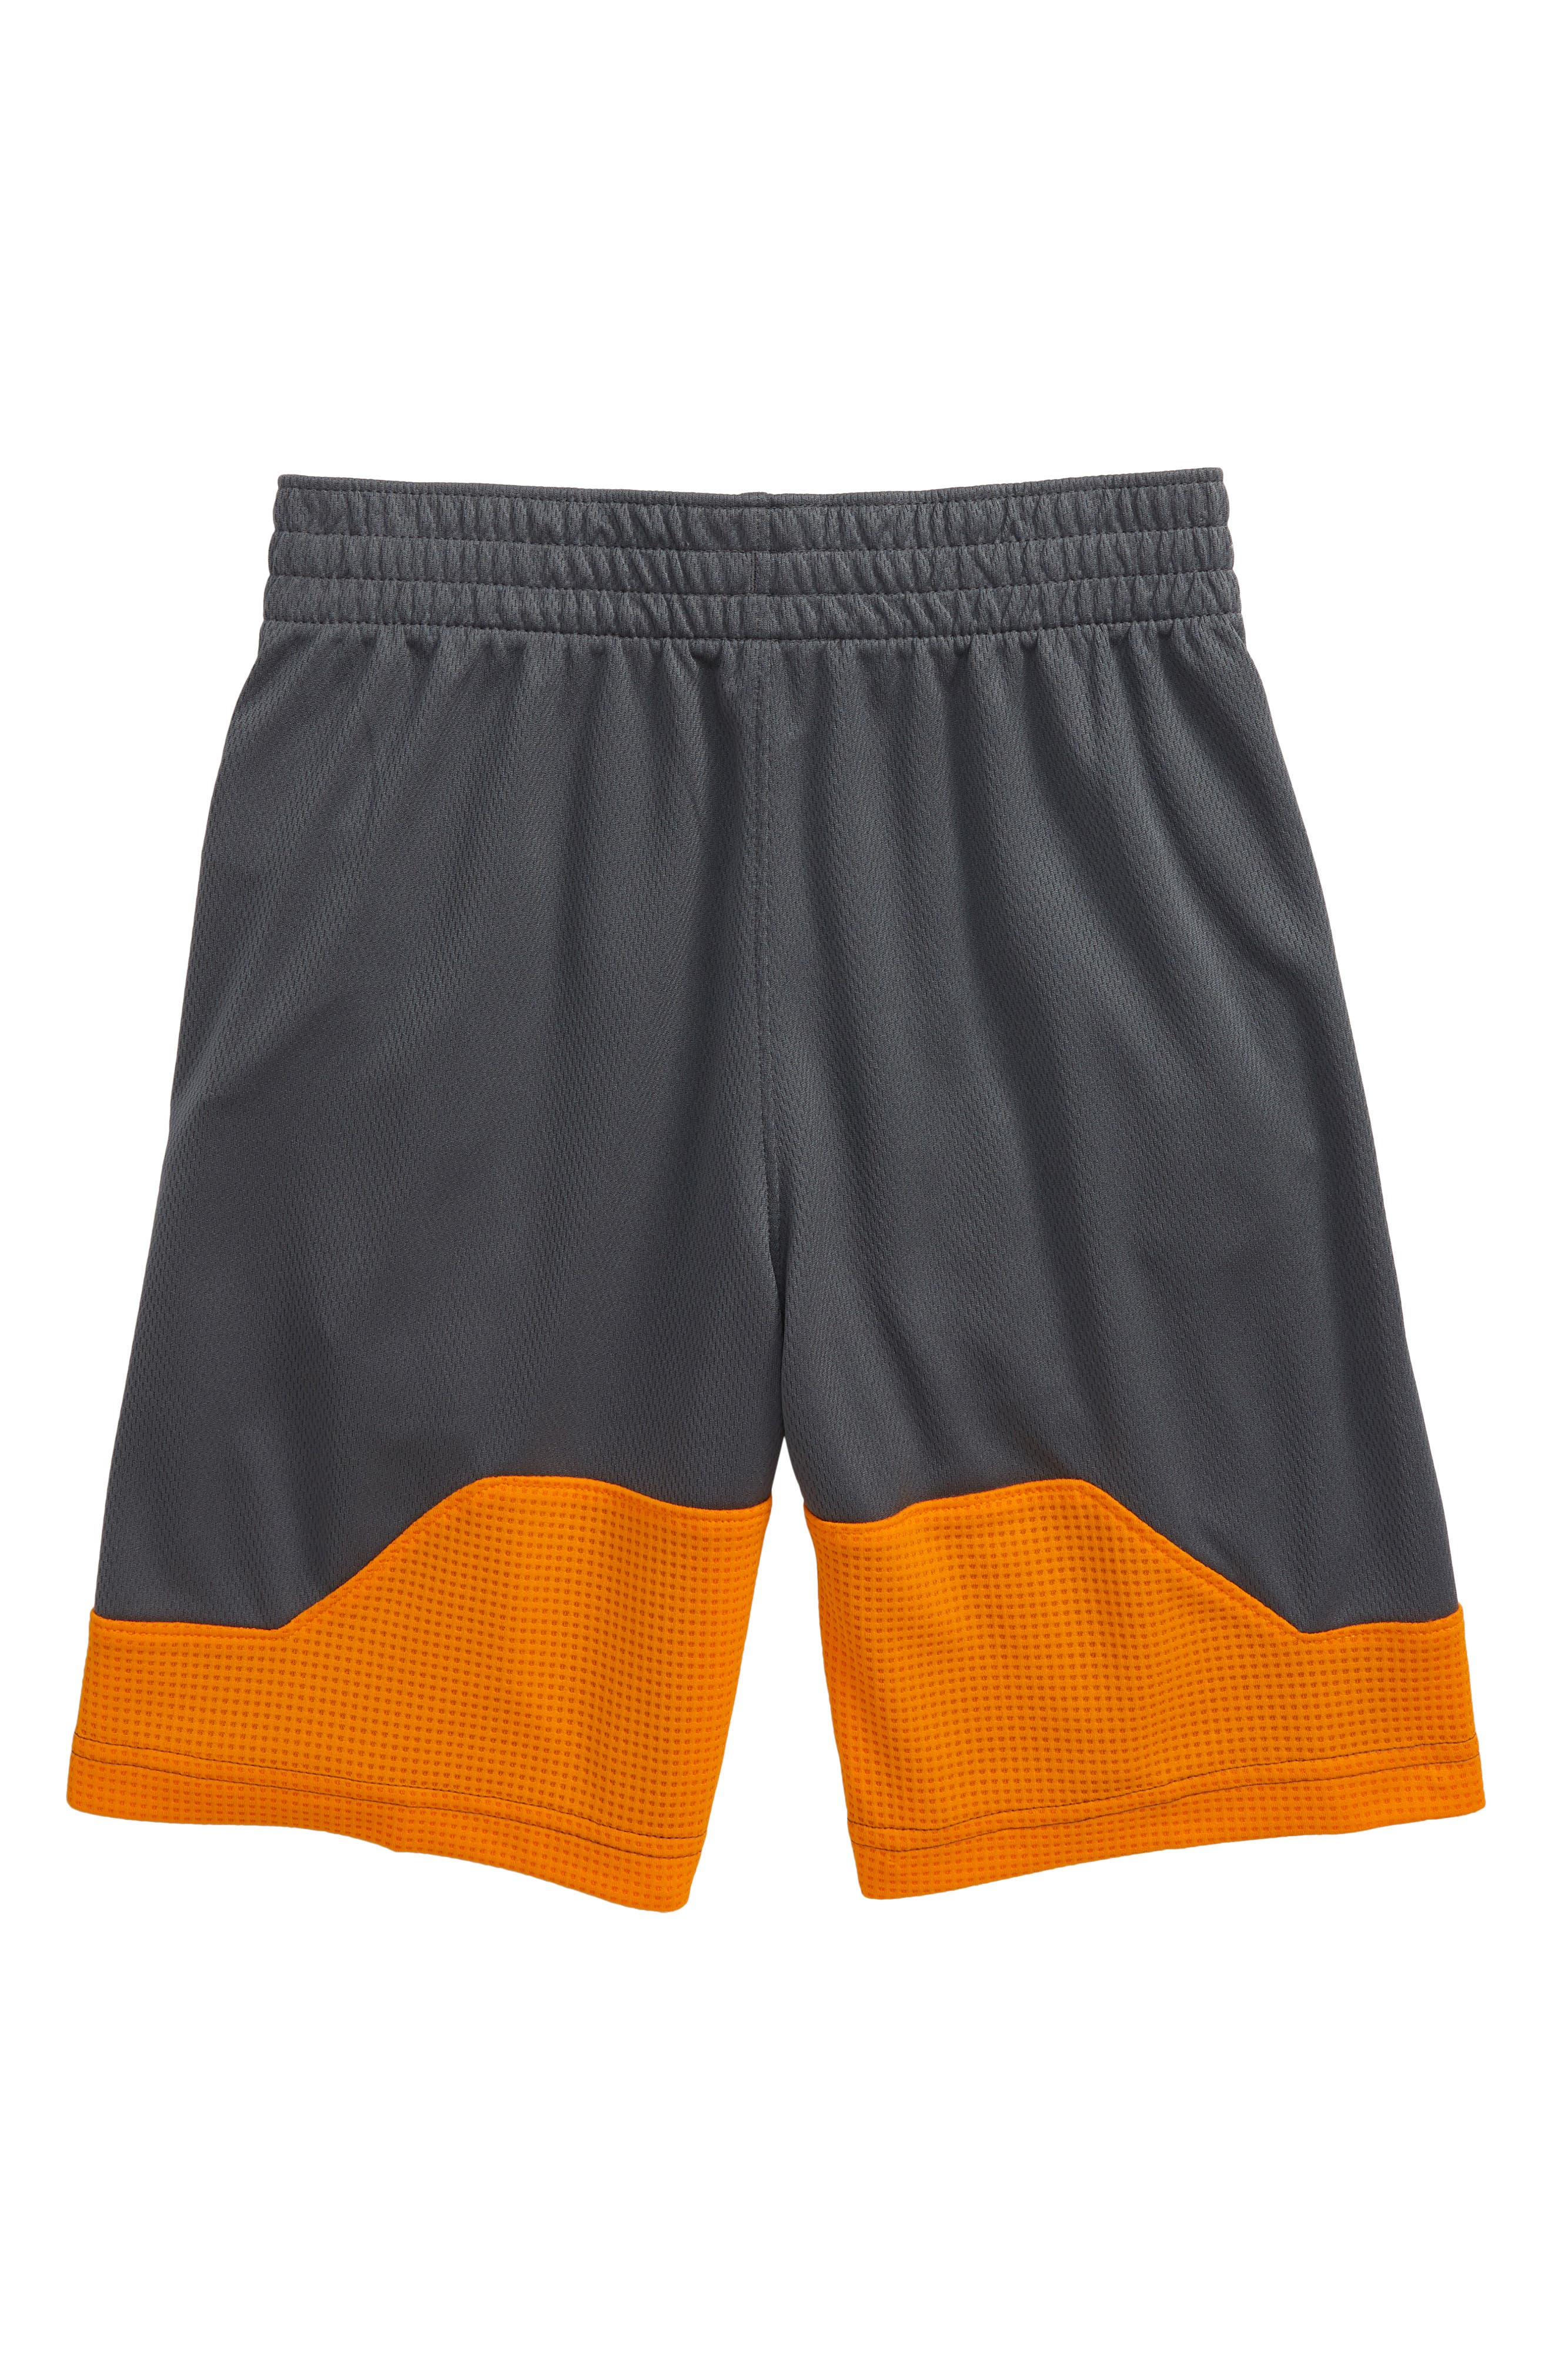 04db5e27c6b3 boys nike shorts